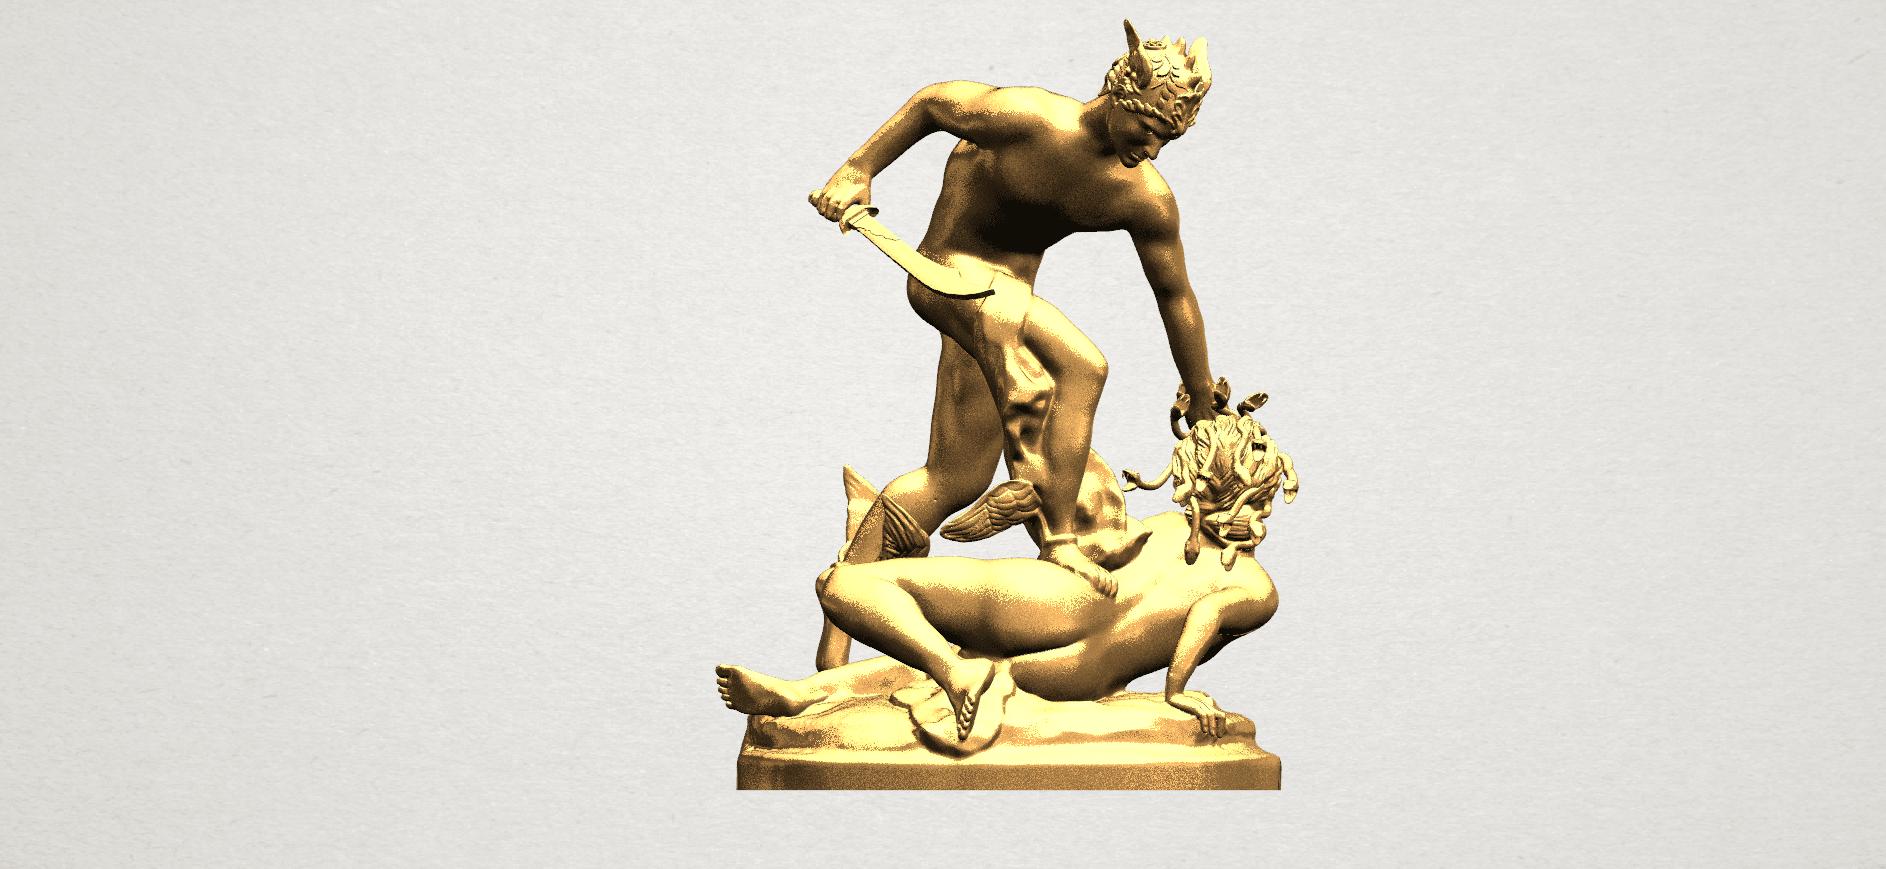 Killing - A06.png Download free STL file Killing 01 • 3D printable model, GeorgesNikkei